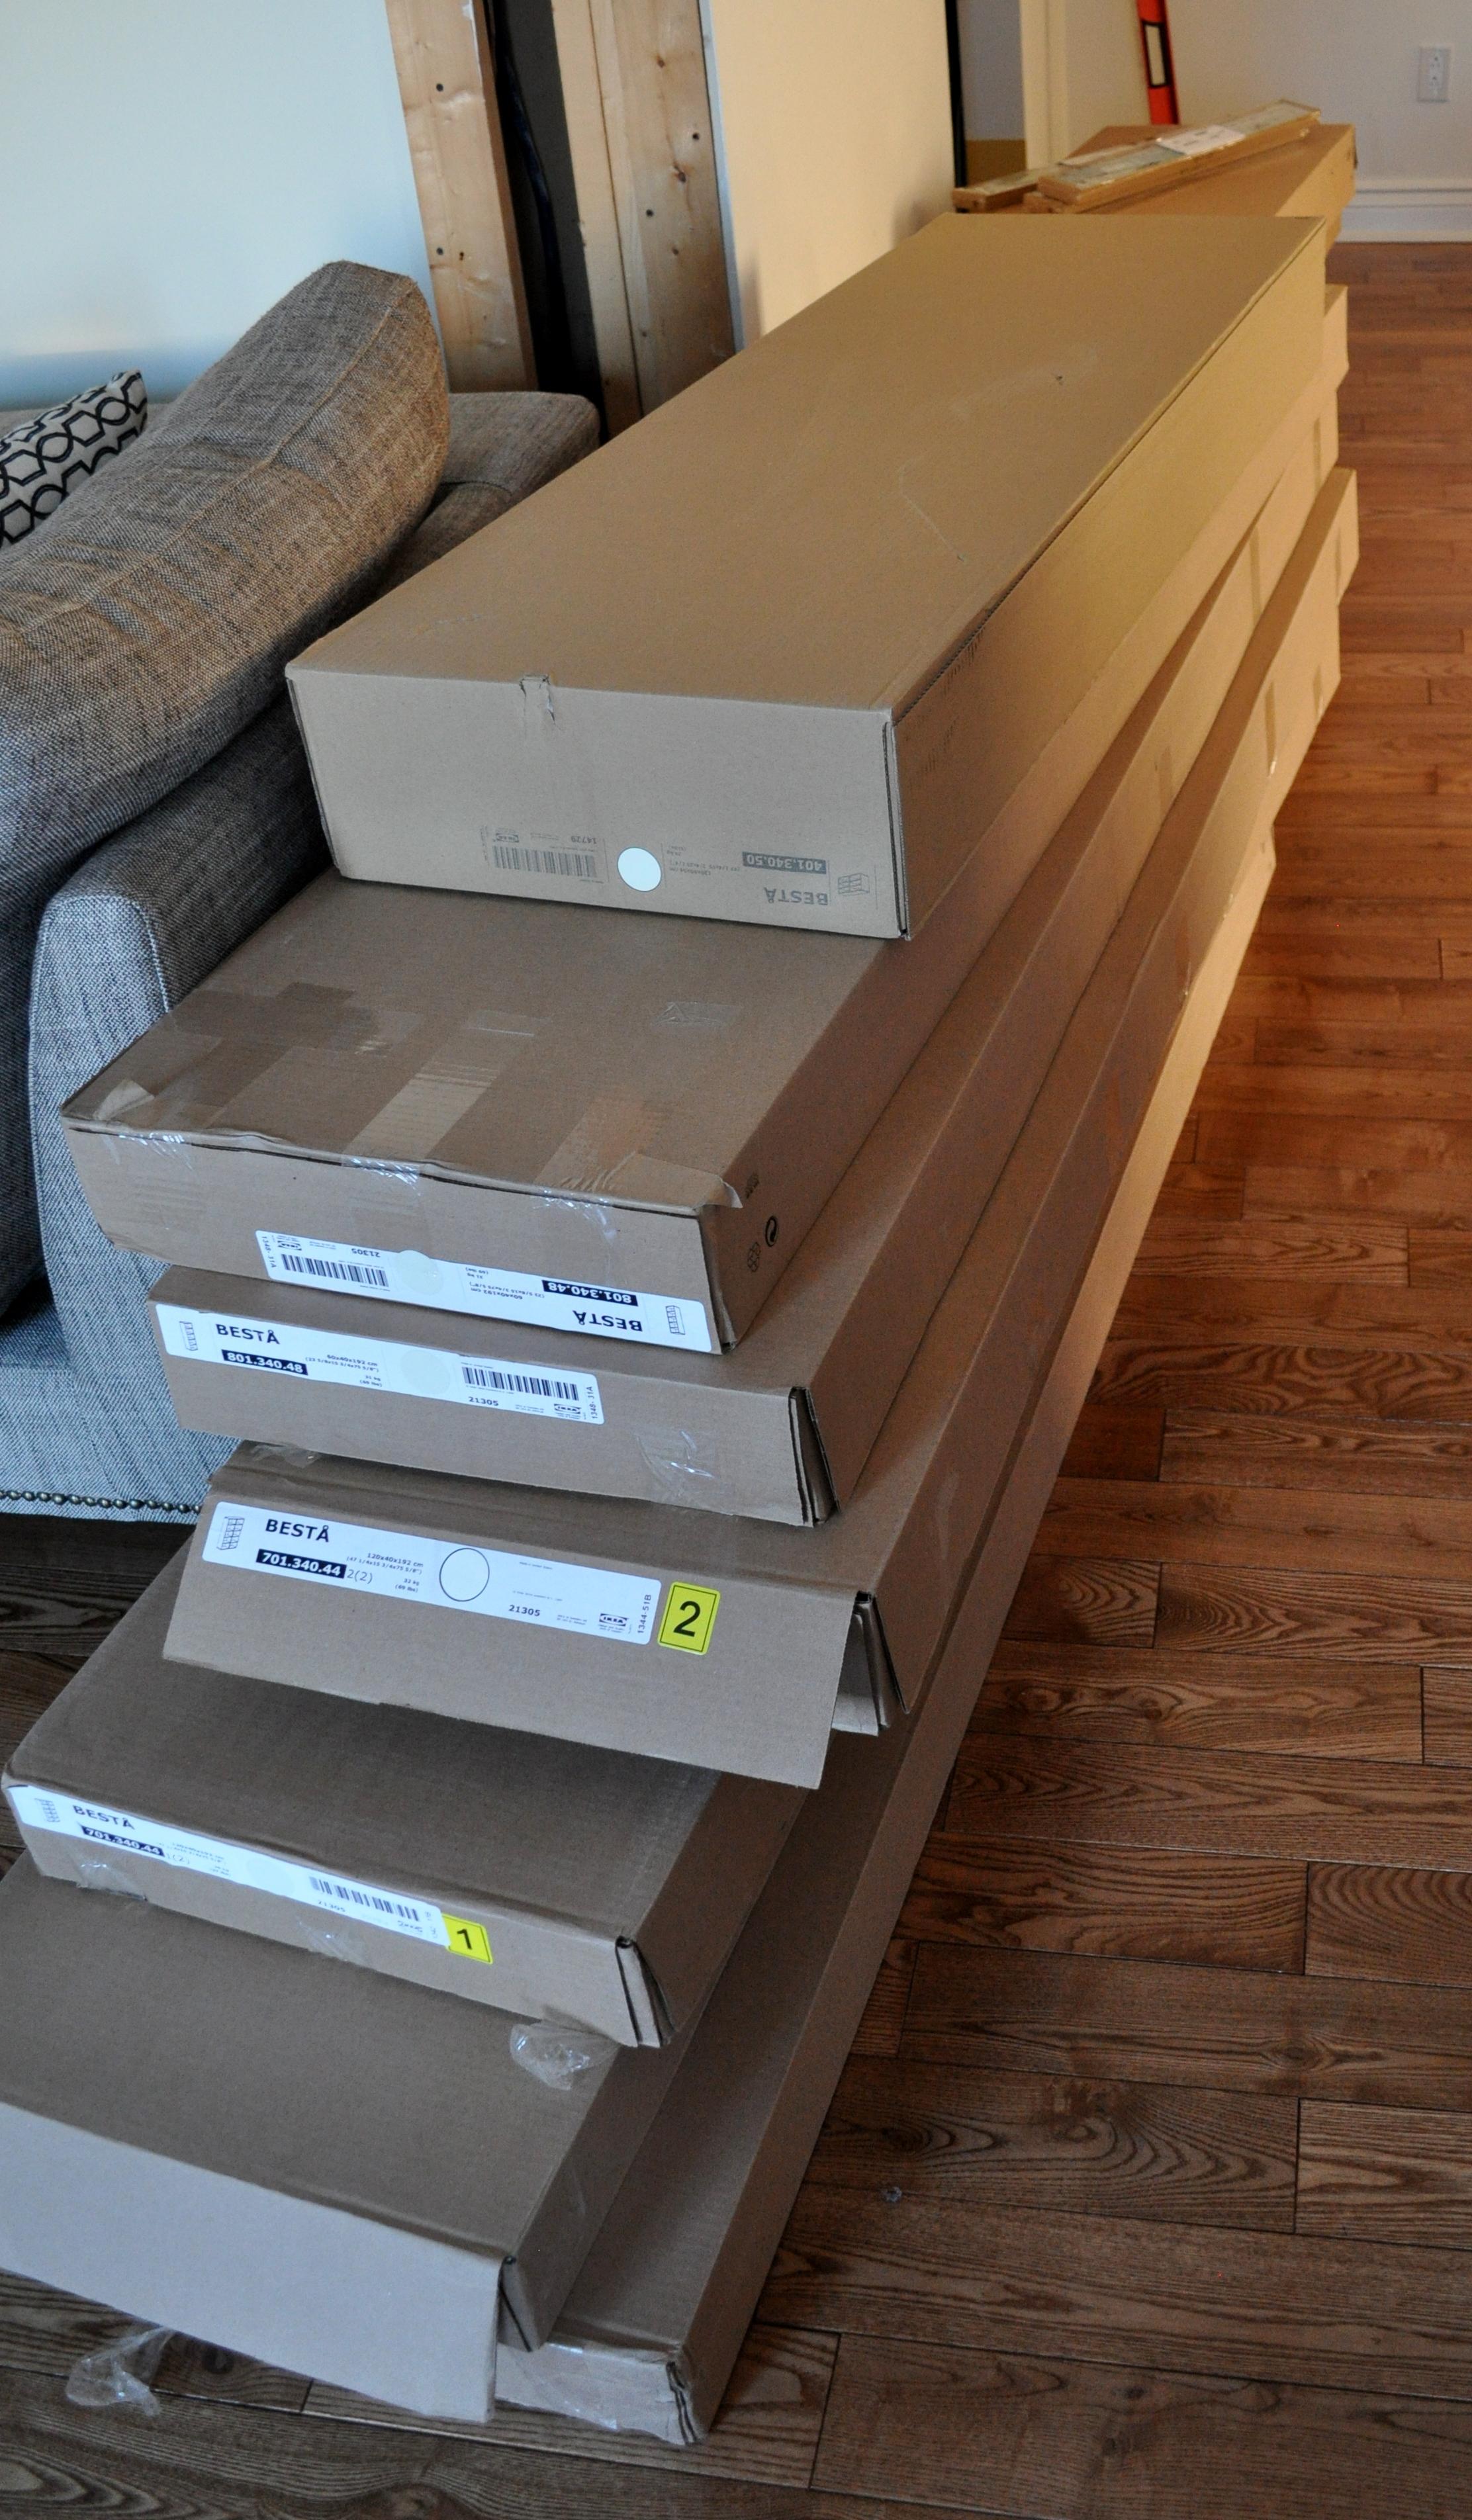 Besta in boxes